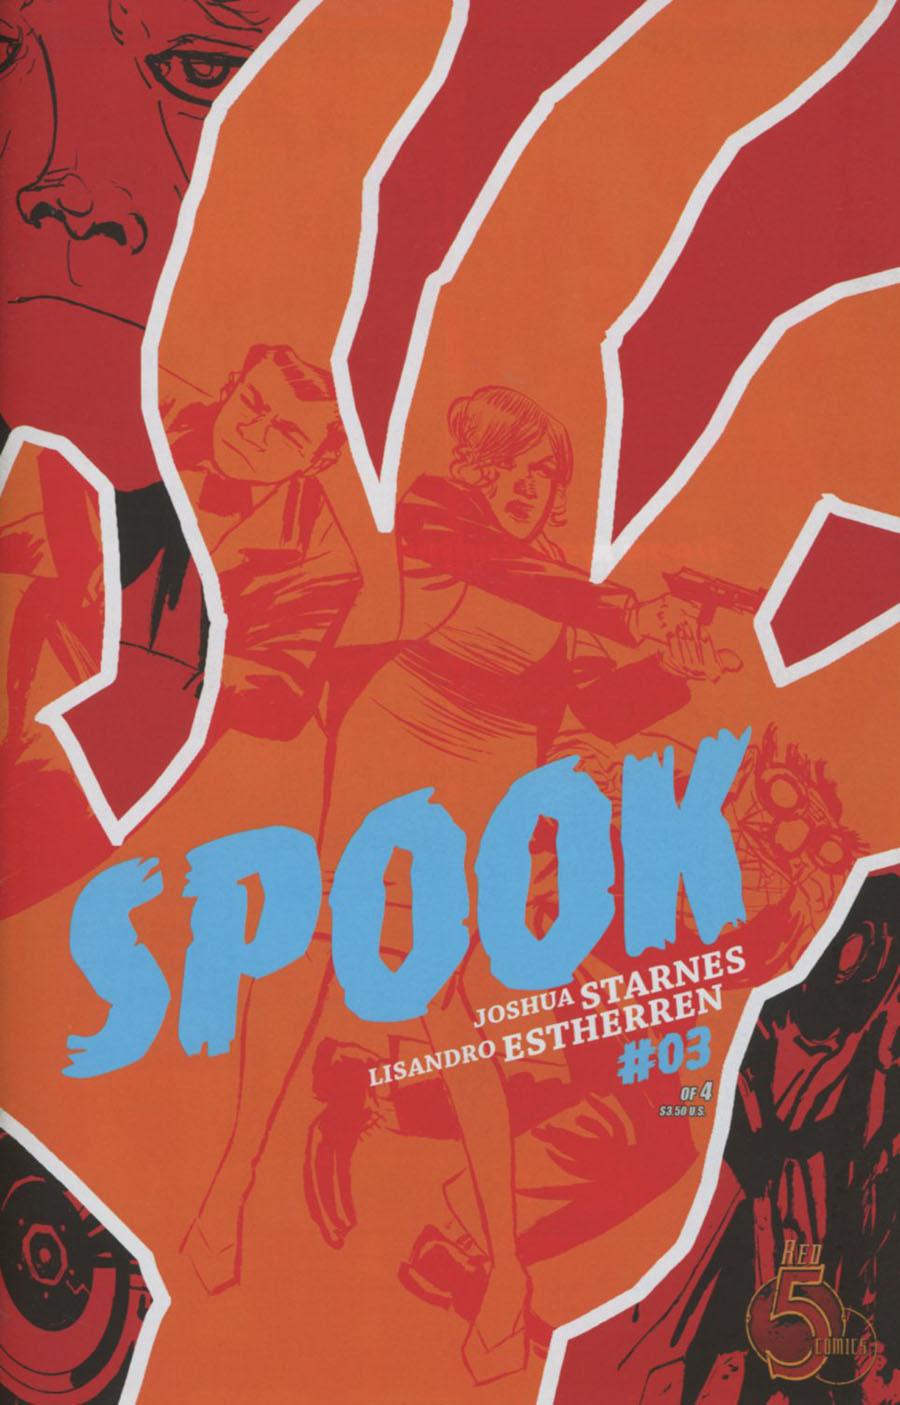 Spook (Red 5 Comics) #3